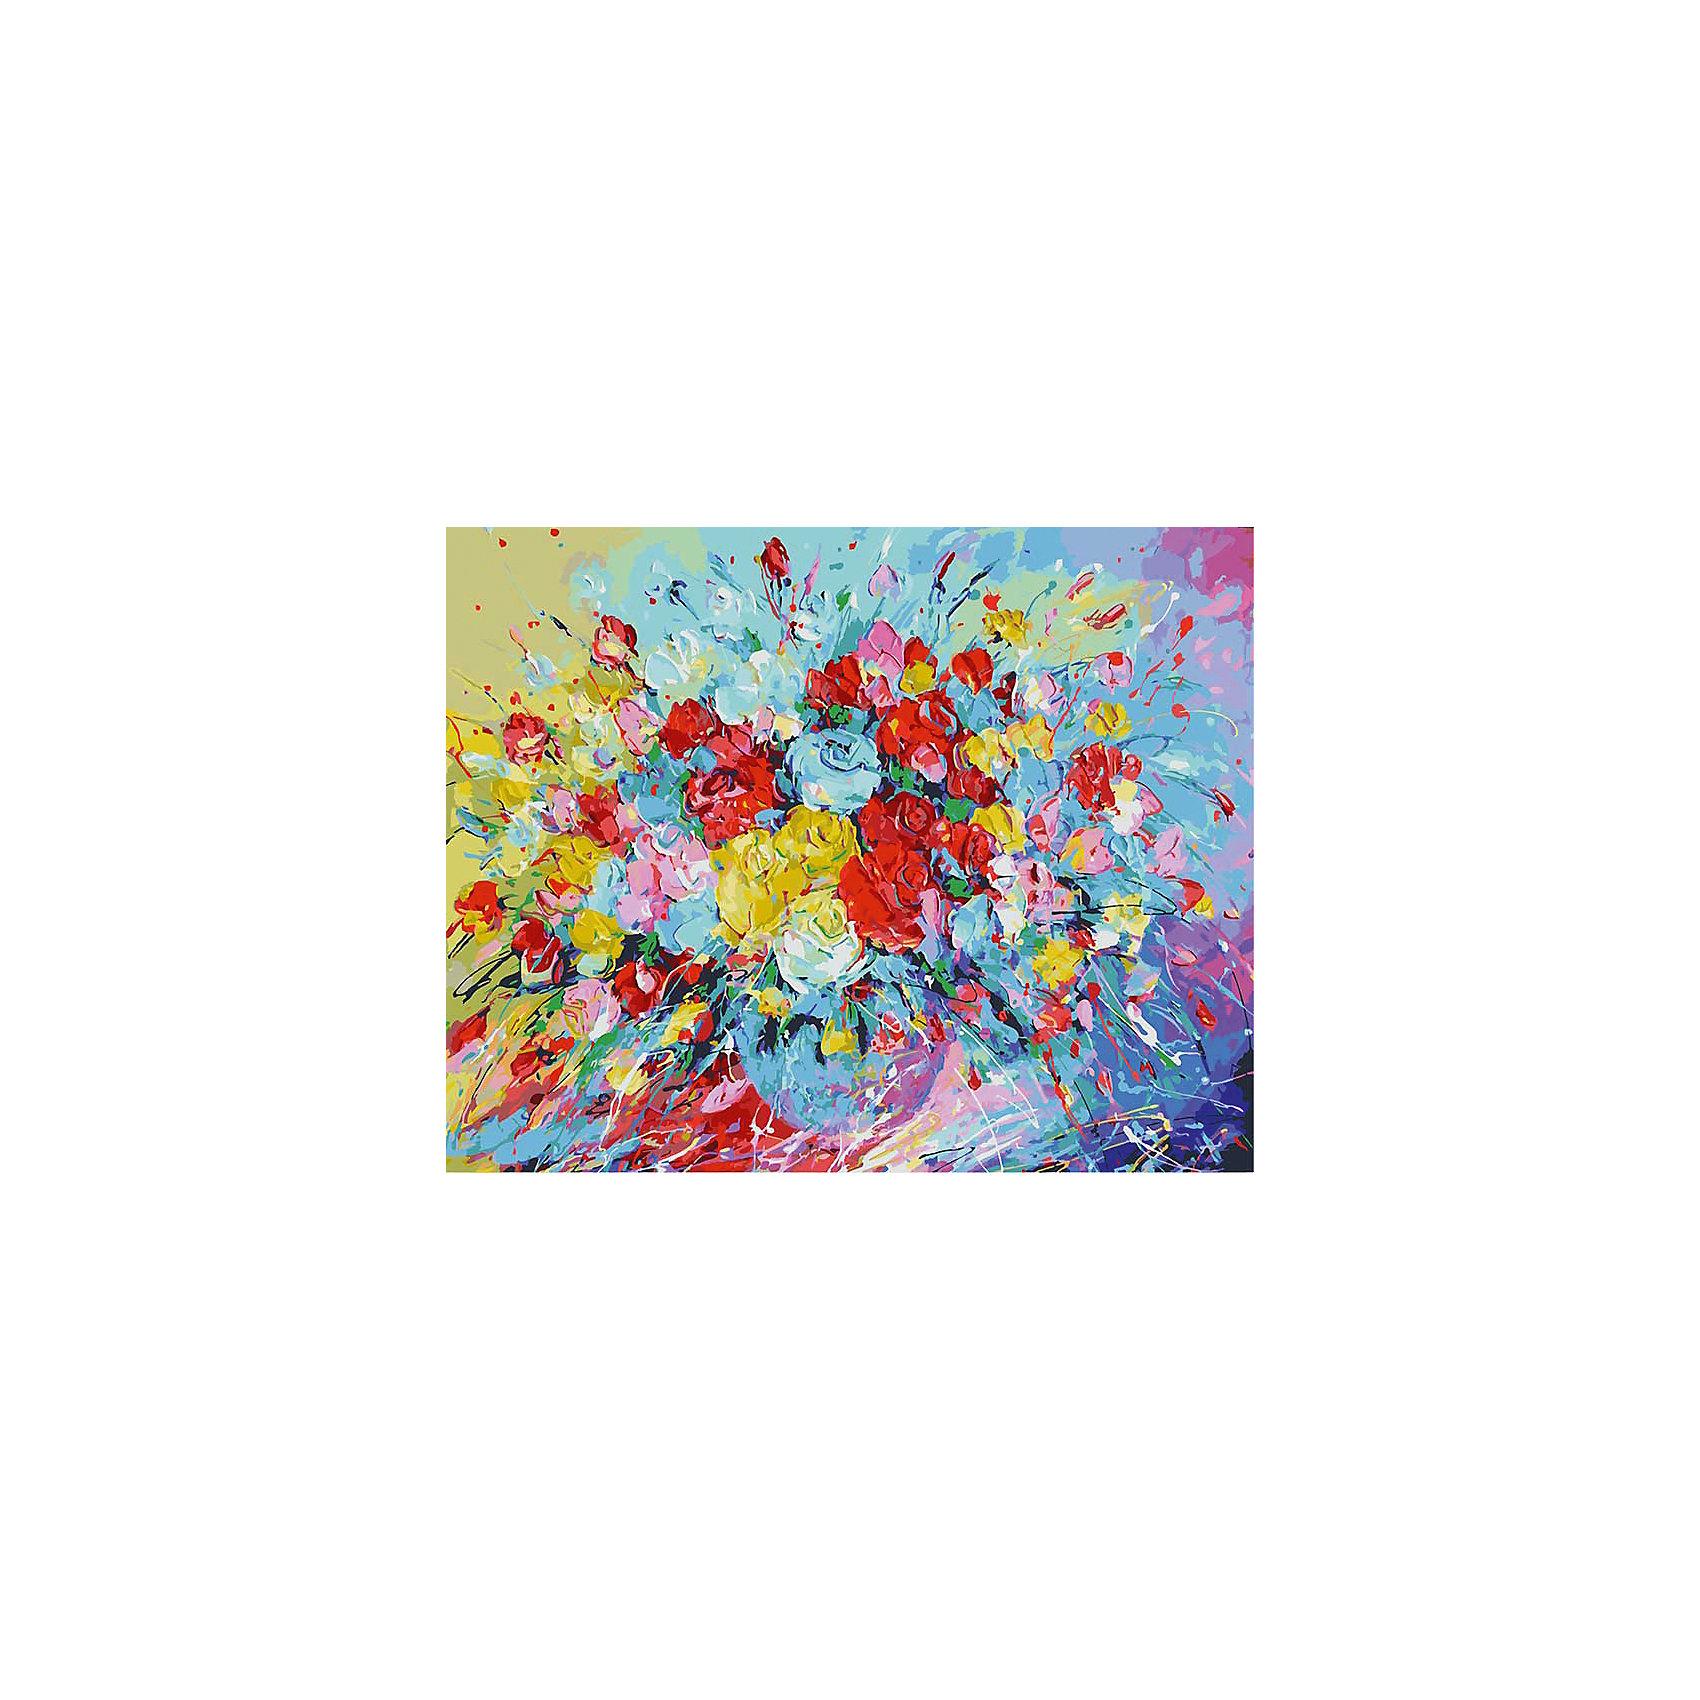 Белоснежка Живопись на холсте 40*50 см Фейерверк из роз